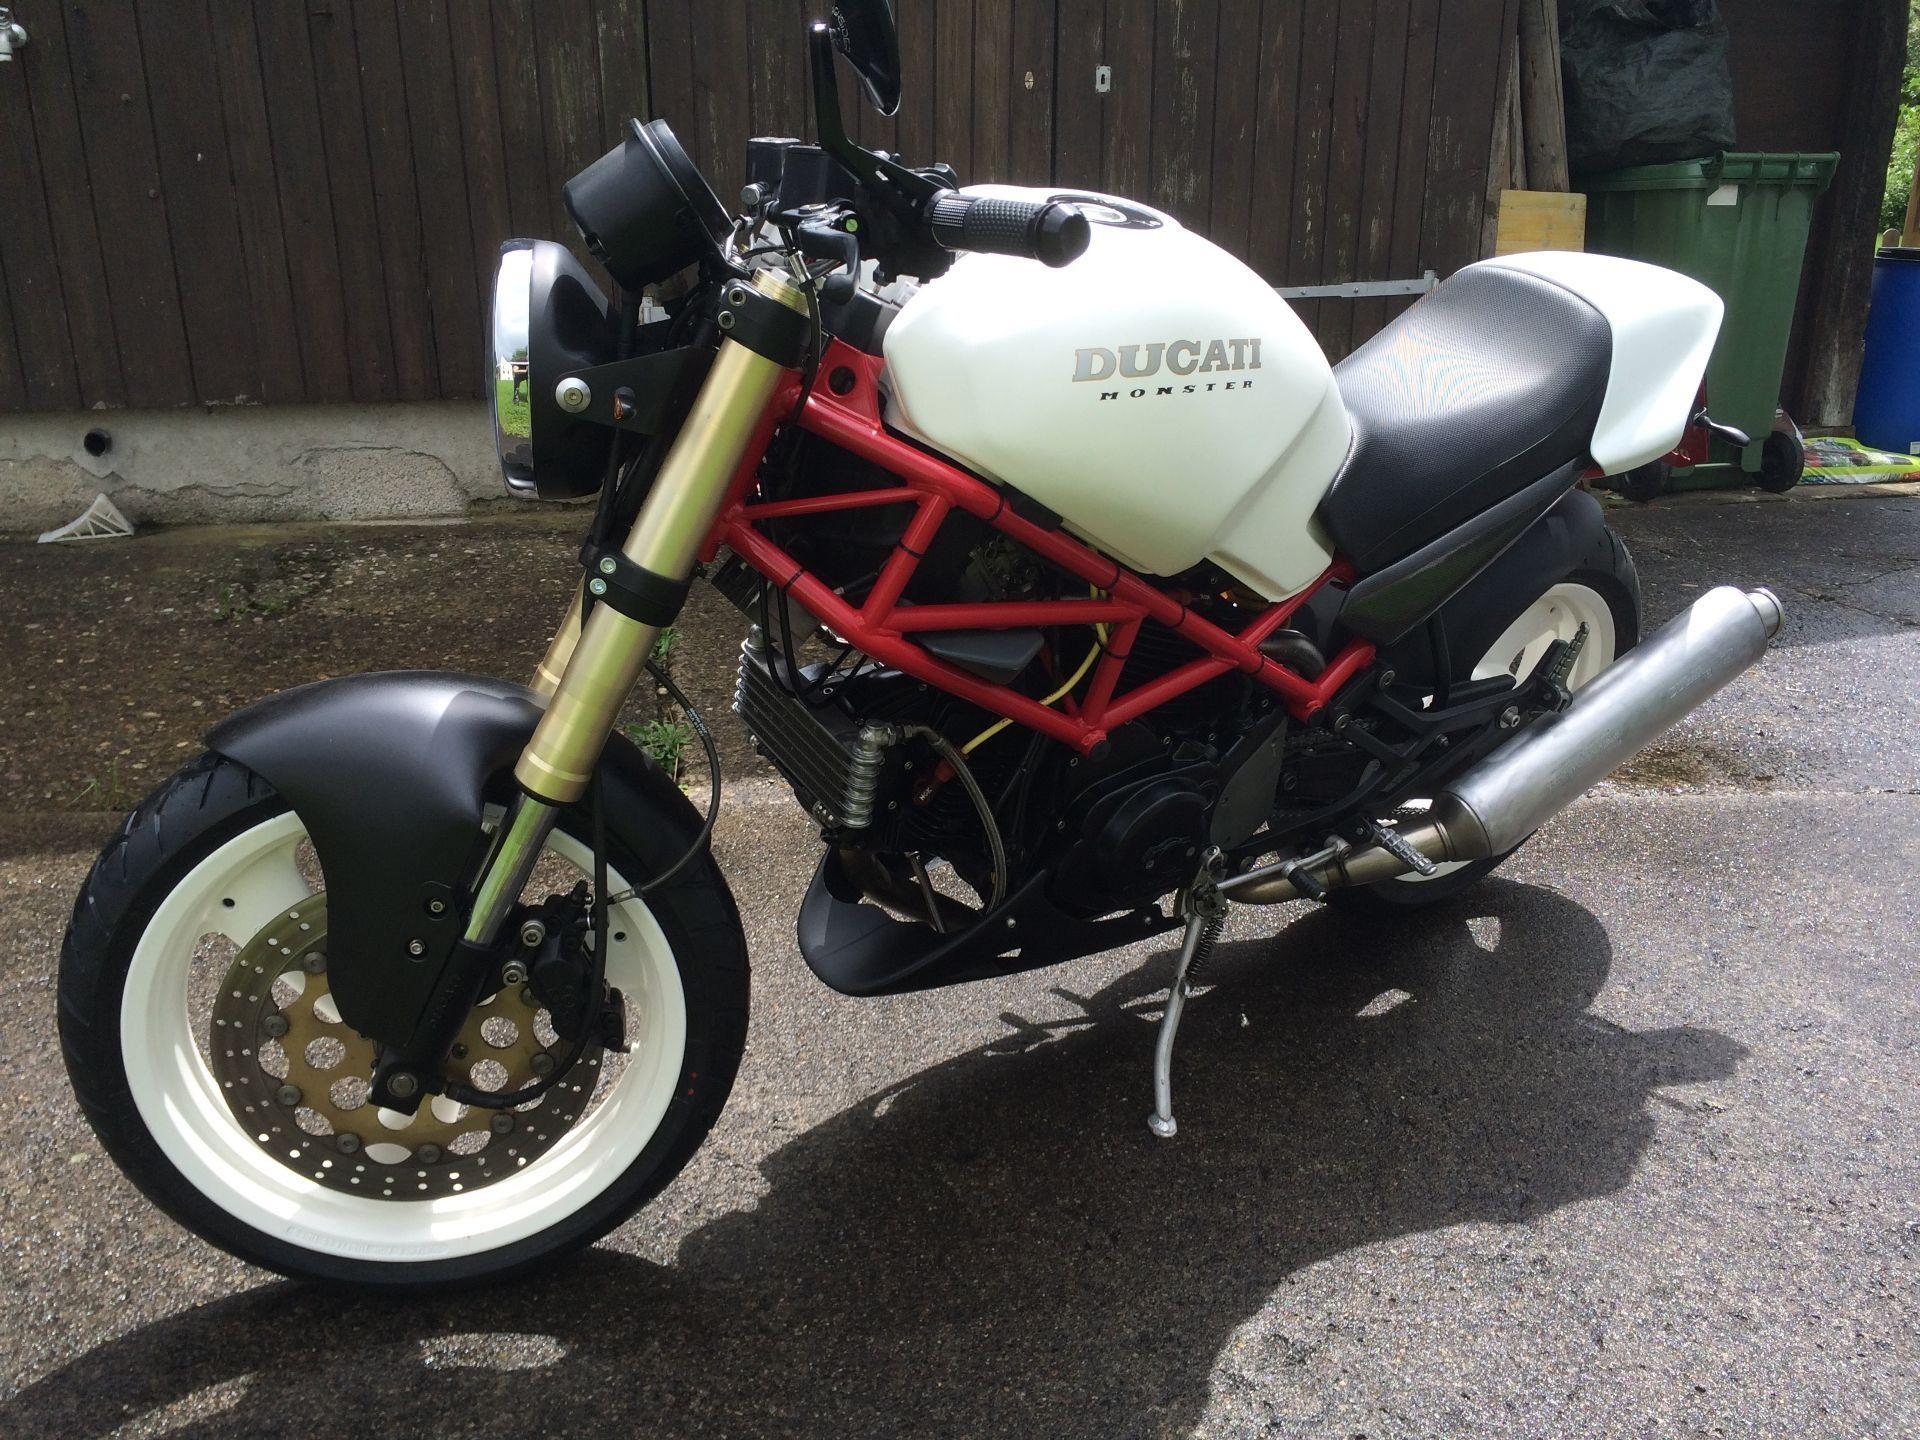 Motorrad Occasion Kaufen Ducati 600 Monster Ze Bikes Wegenstetten